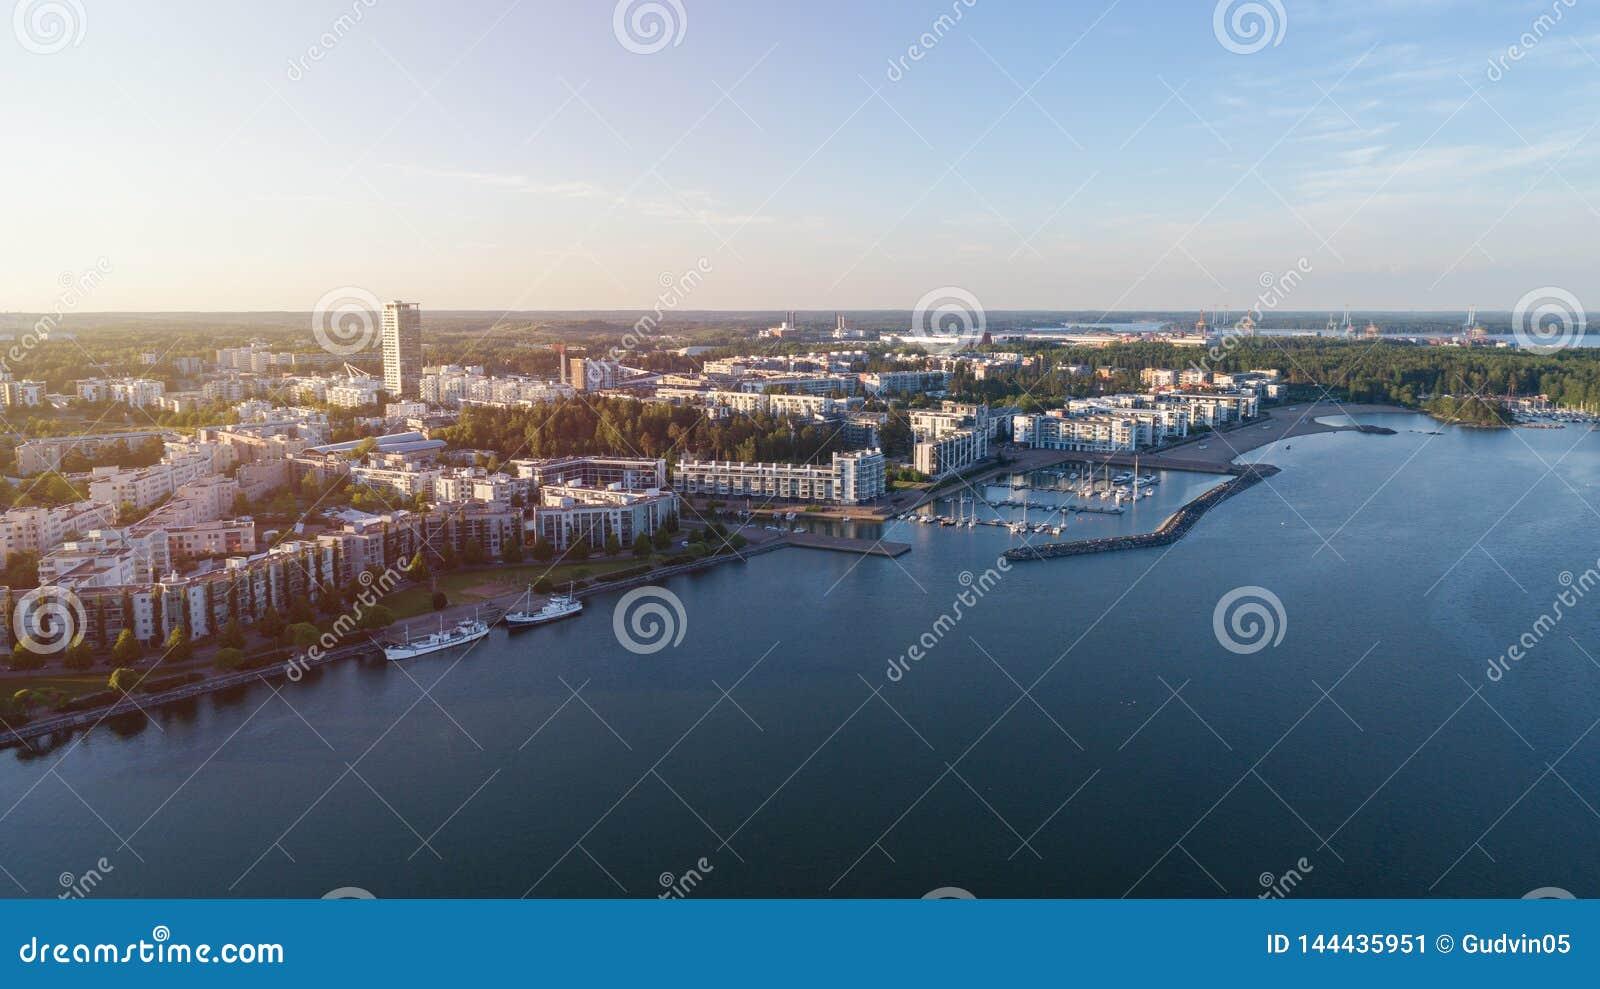 Apartment buildings in the Vuosaari district of Helsinki at sunset, Finland. Beautiful summer panorama